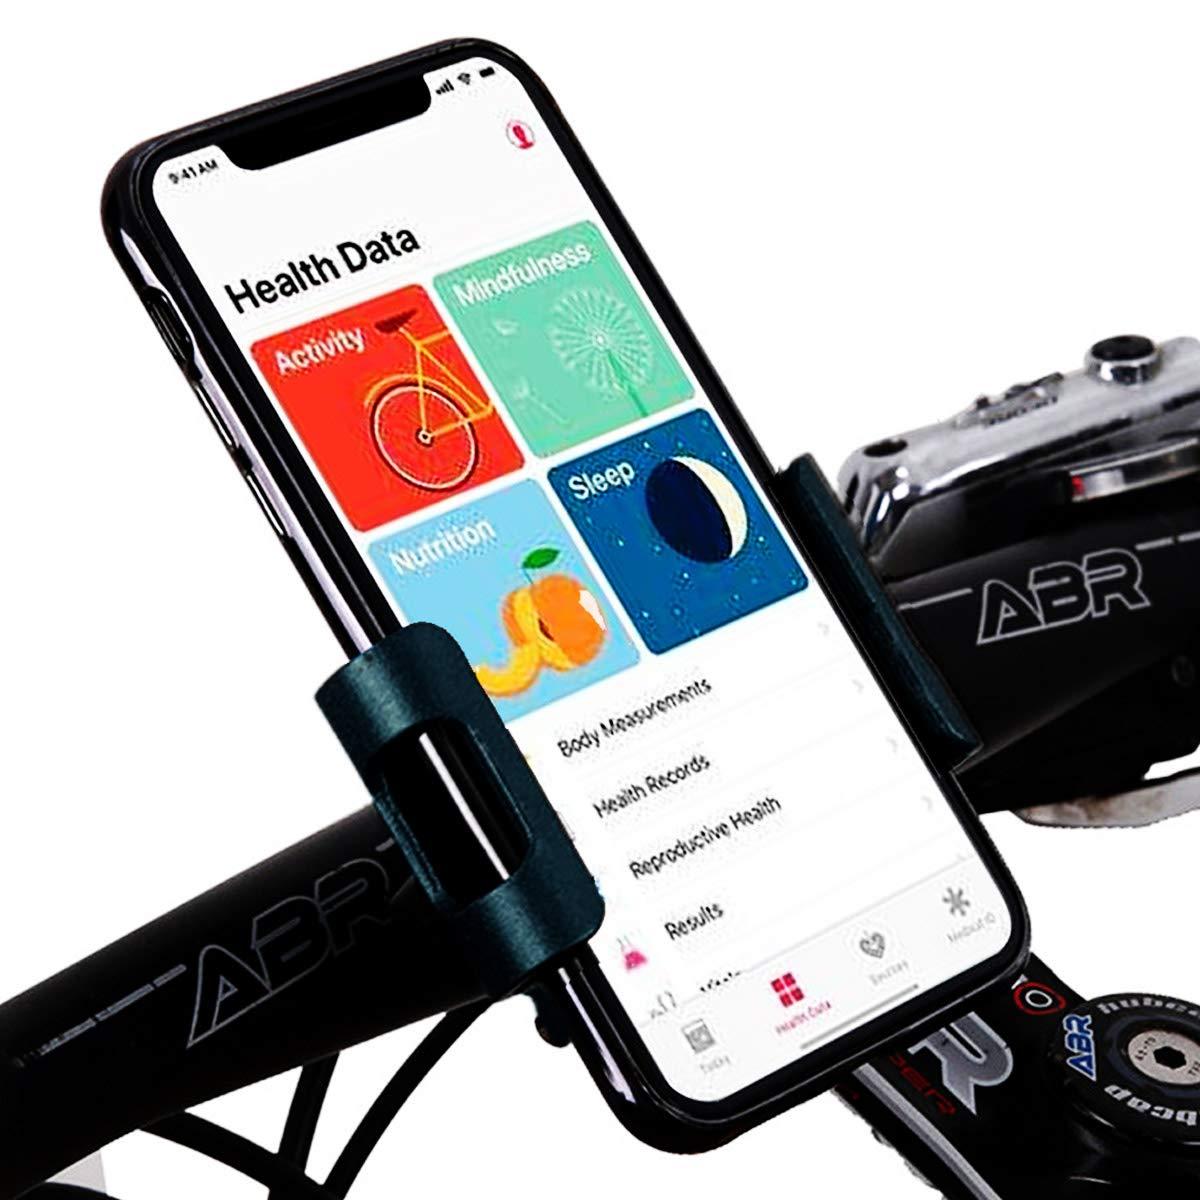 Vohoney Handyhalterung Fahrrad Aluminium Handyhalter Motorrad Handy Halterung Anti-Shake Fahrrad Handy Halterung Universal f/ür 4,0-6,2 Zoll Smartphone mit 360/° Drehbar Handyhalterung Fahrrad Schwarz